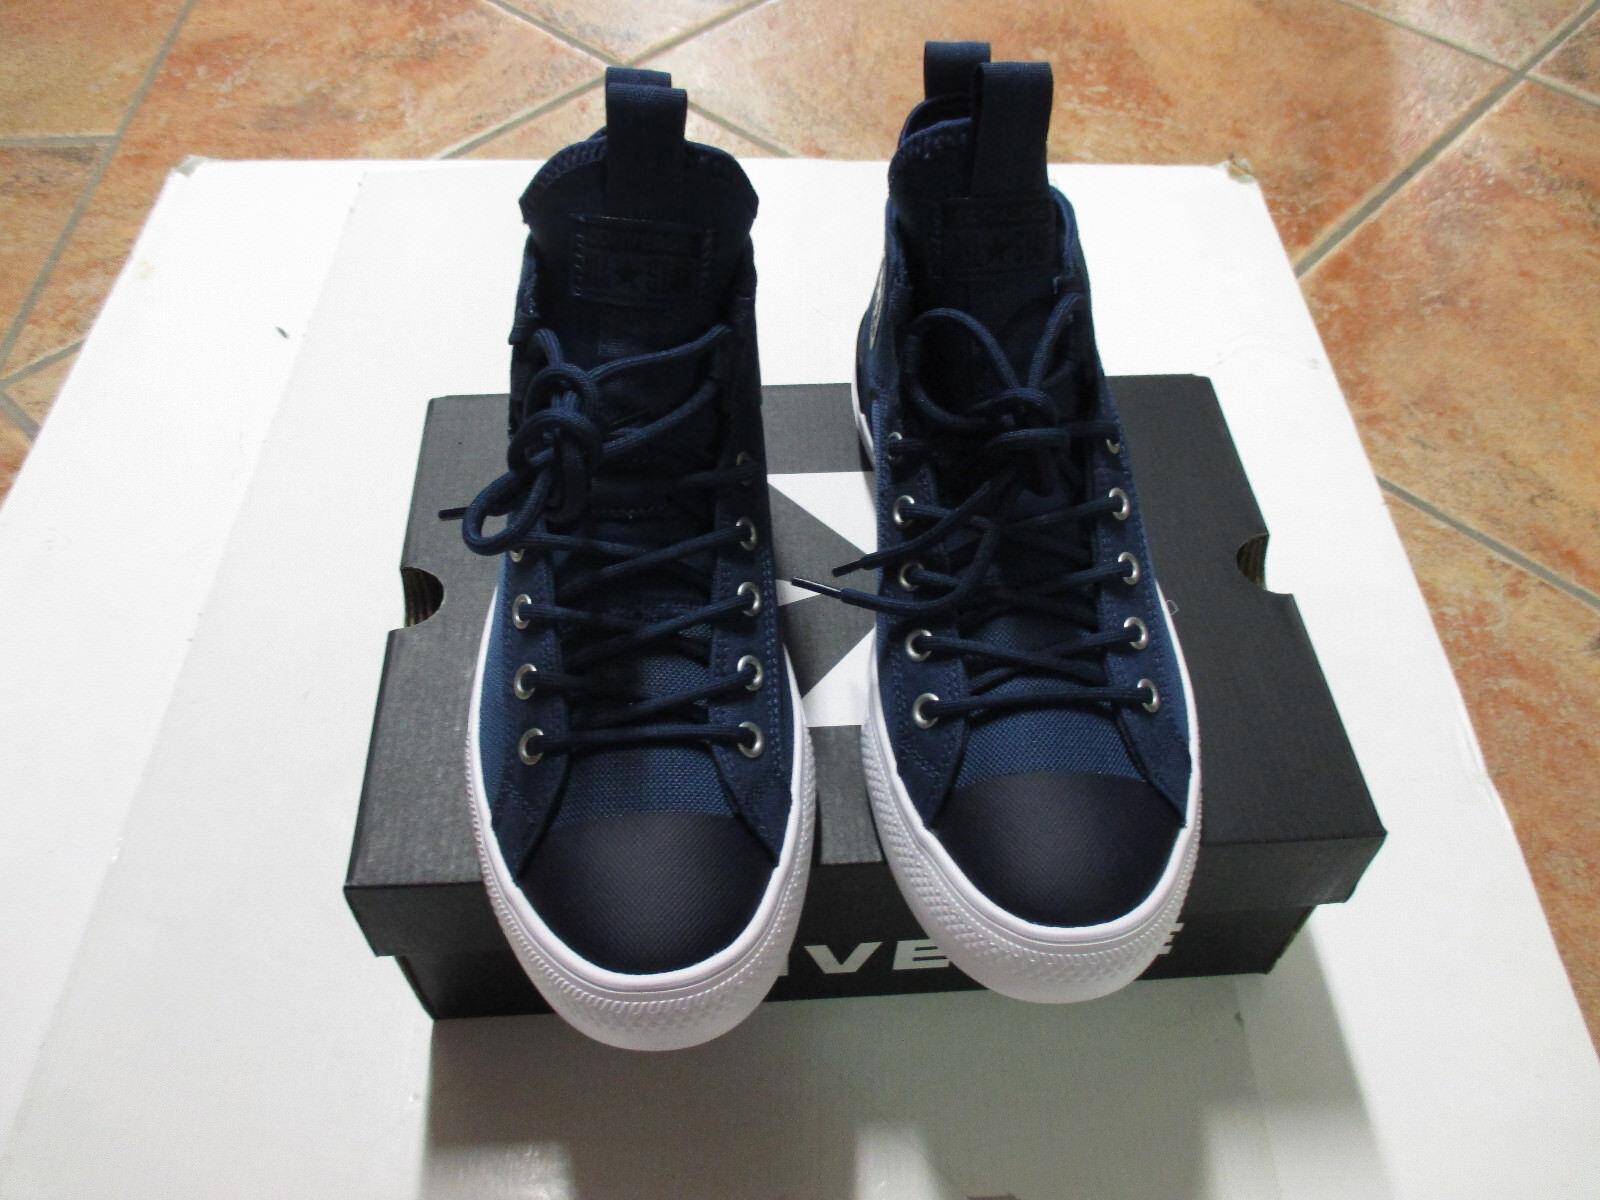 Converse Chuck Taylor All Star Ultra Gr 40 Navy Black White 159631C  Sneaker NEU